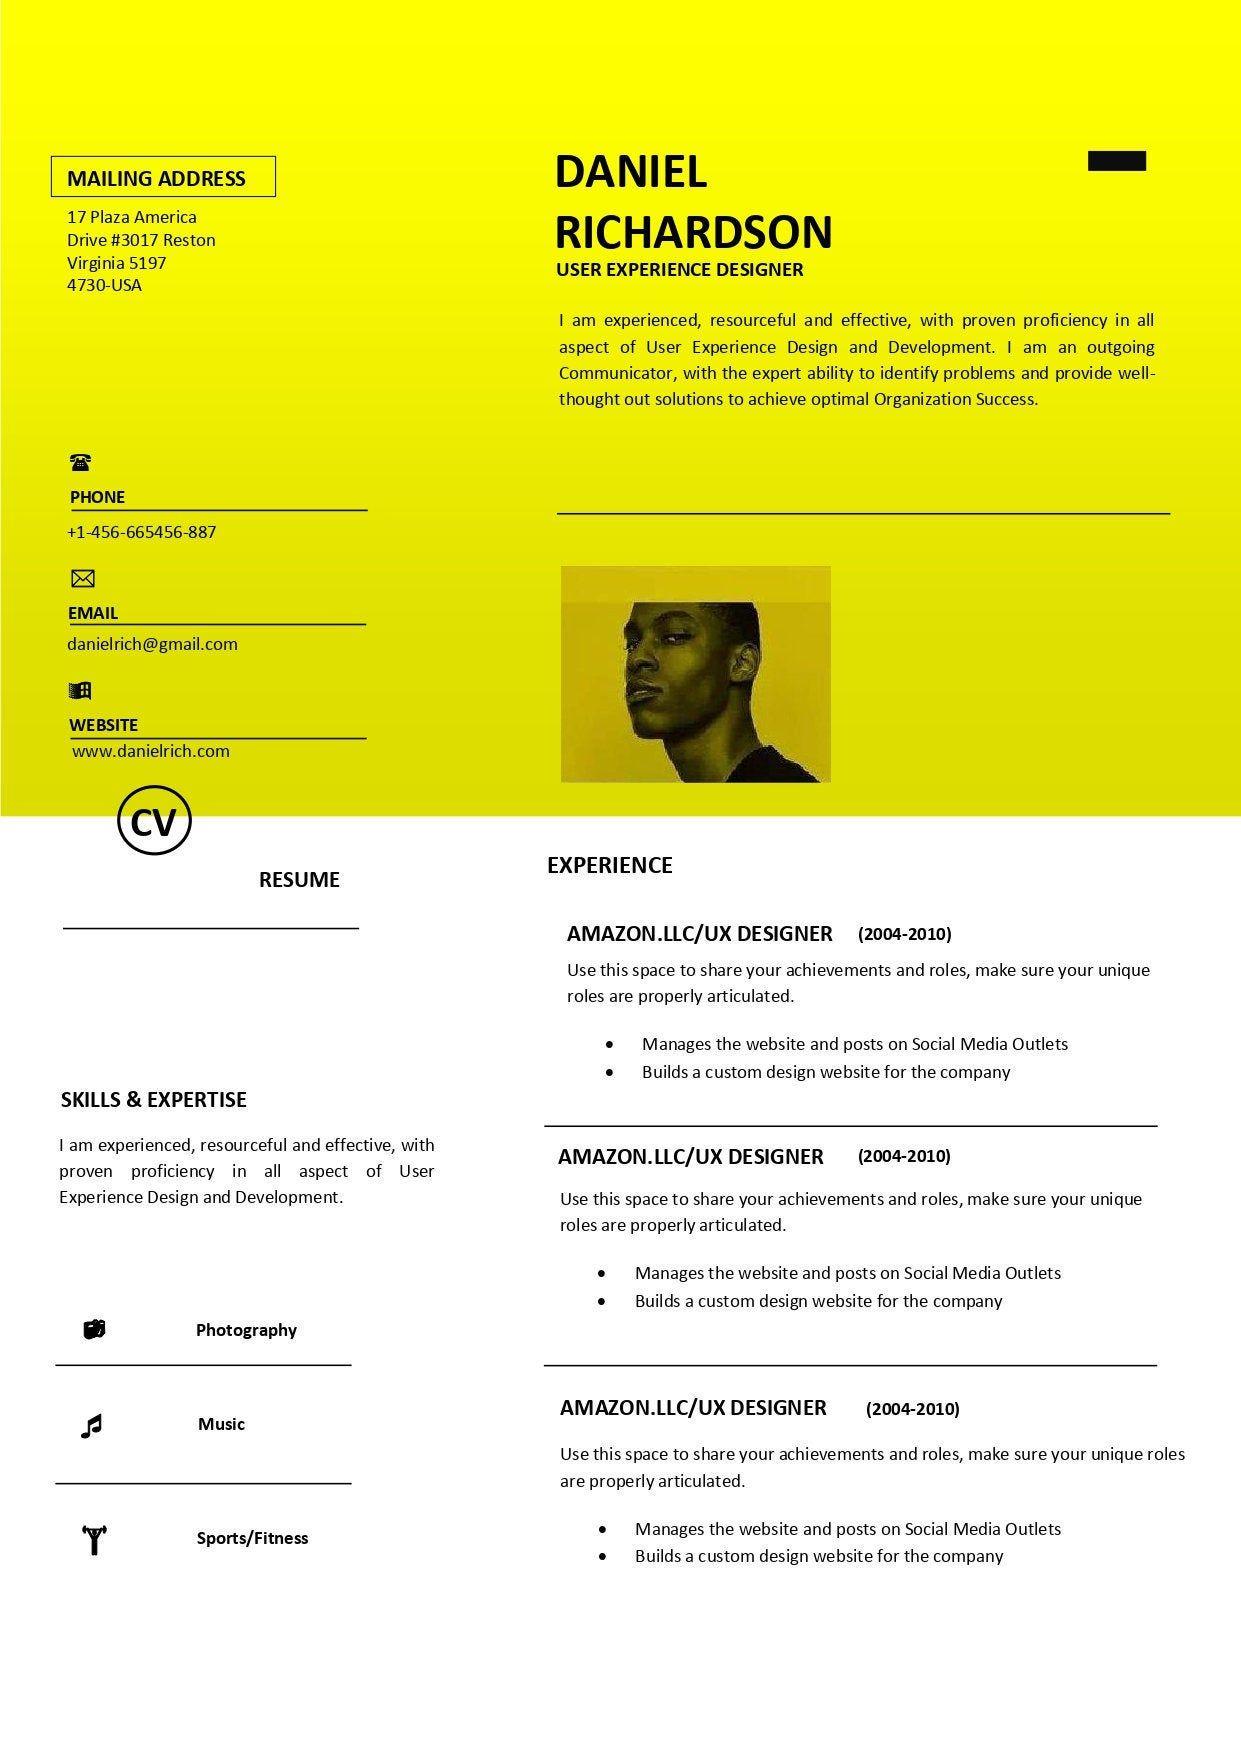 ATS Compliant Resume Word Resume template CV Modern Resume | Etsy